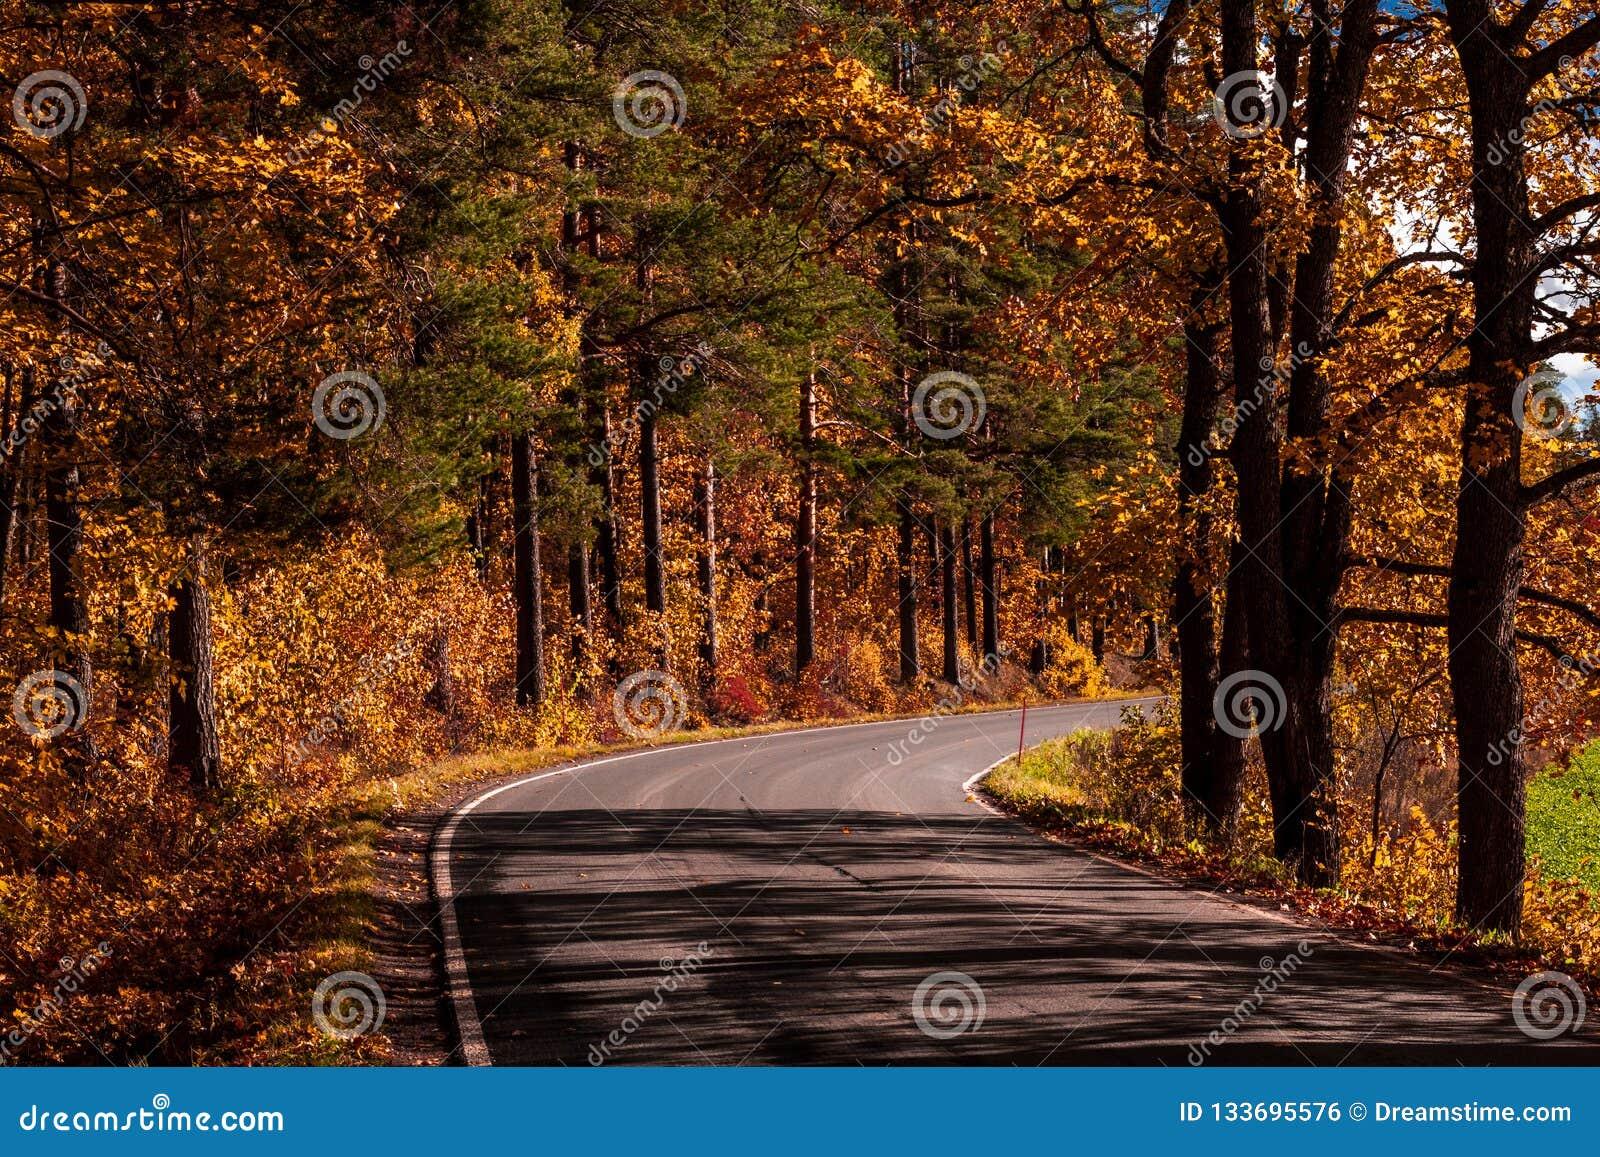 Road trough autumn colored woods.